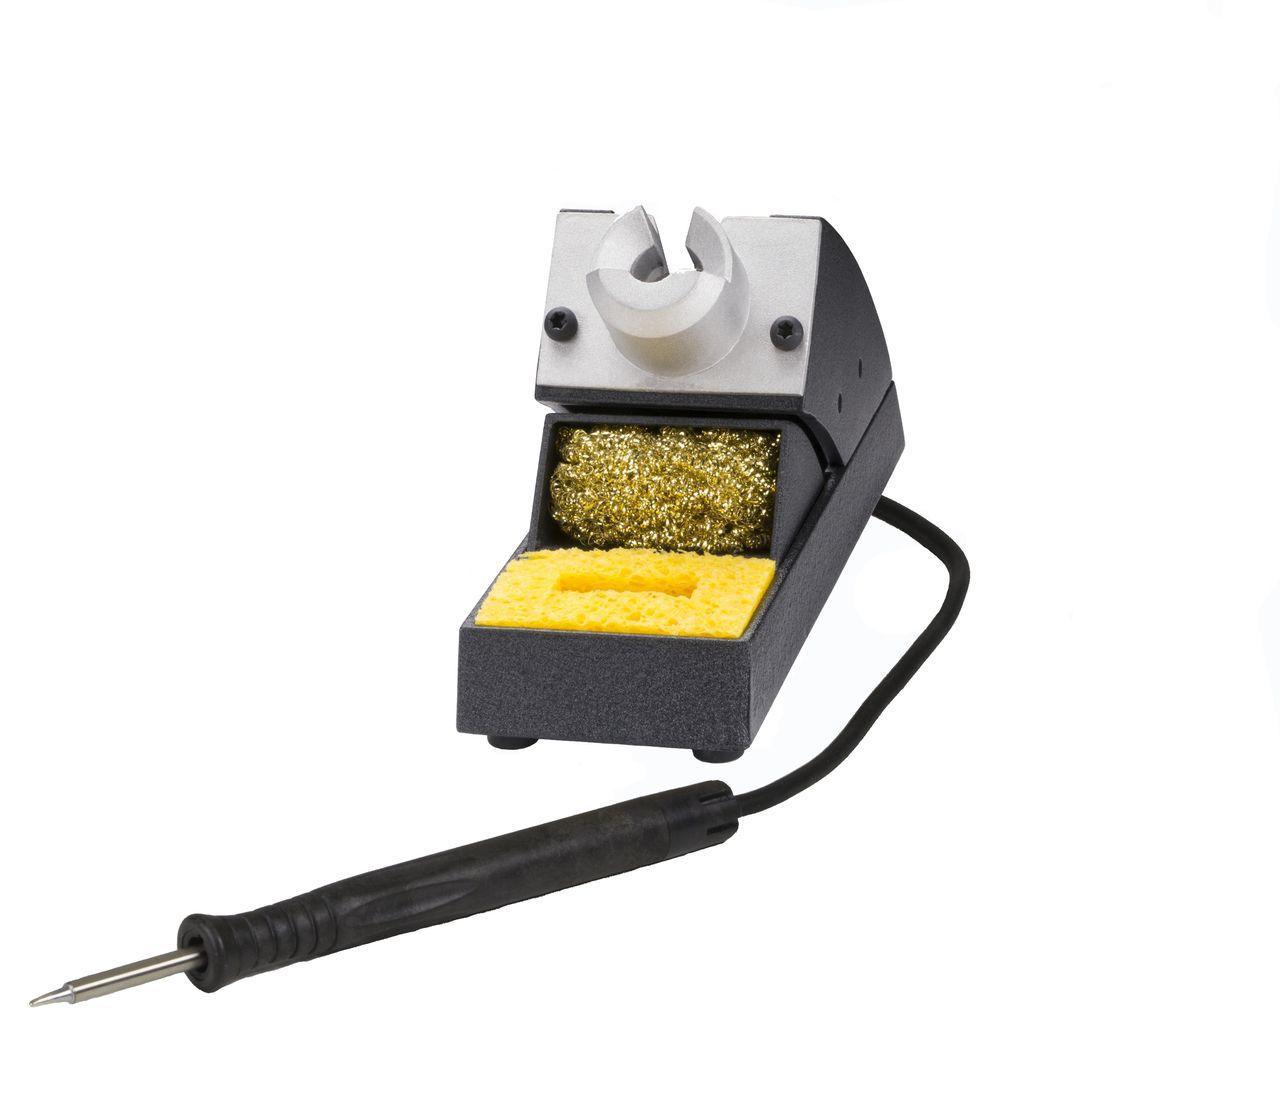 6993-0263 Kit de ferro de solda TD-100 IntelliHeat